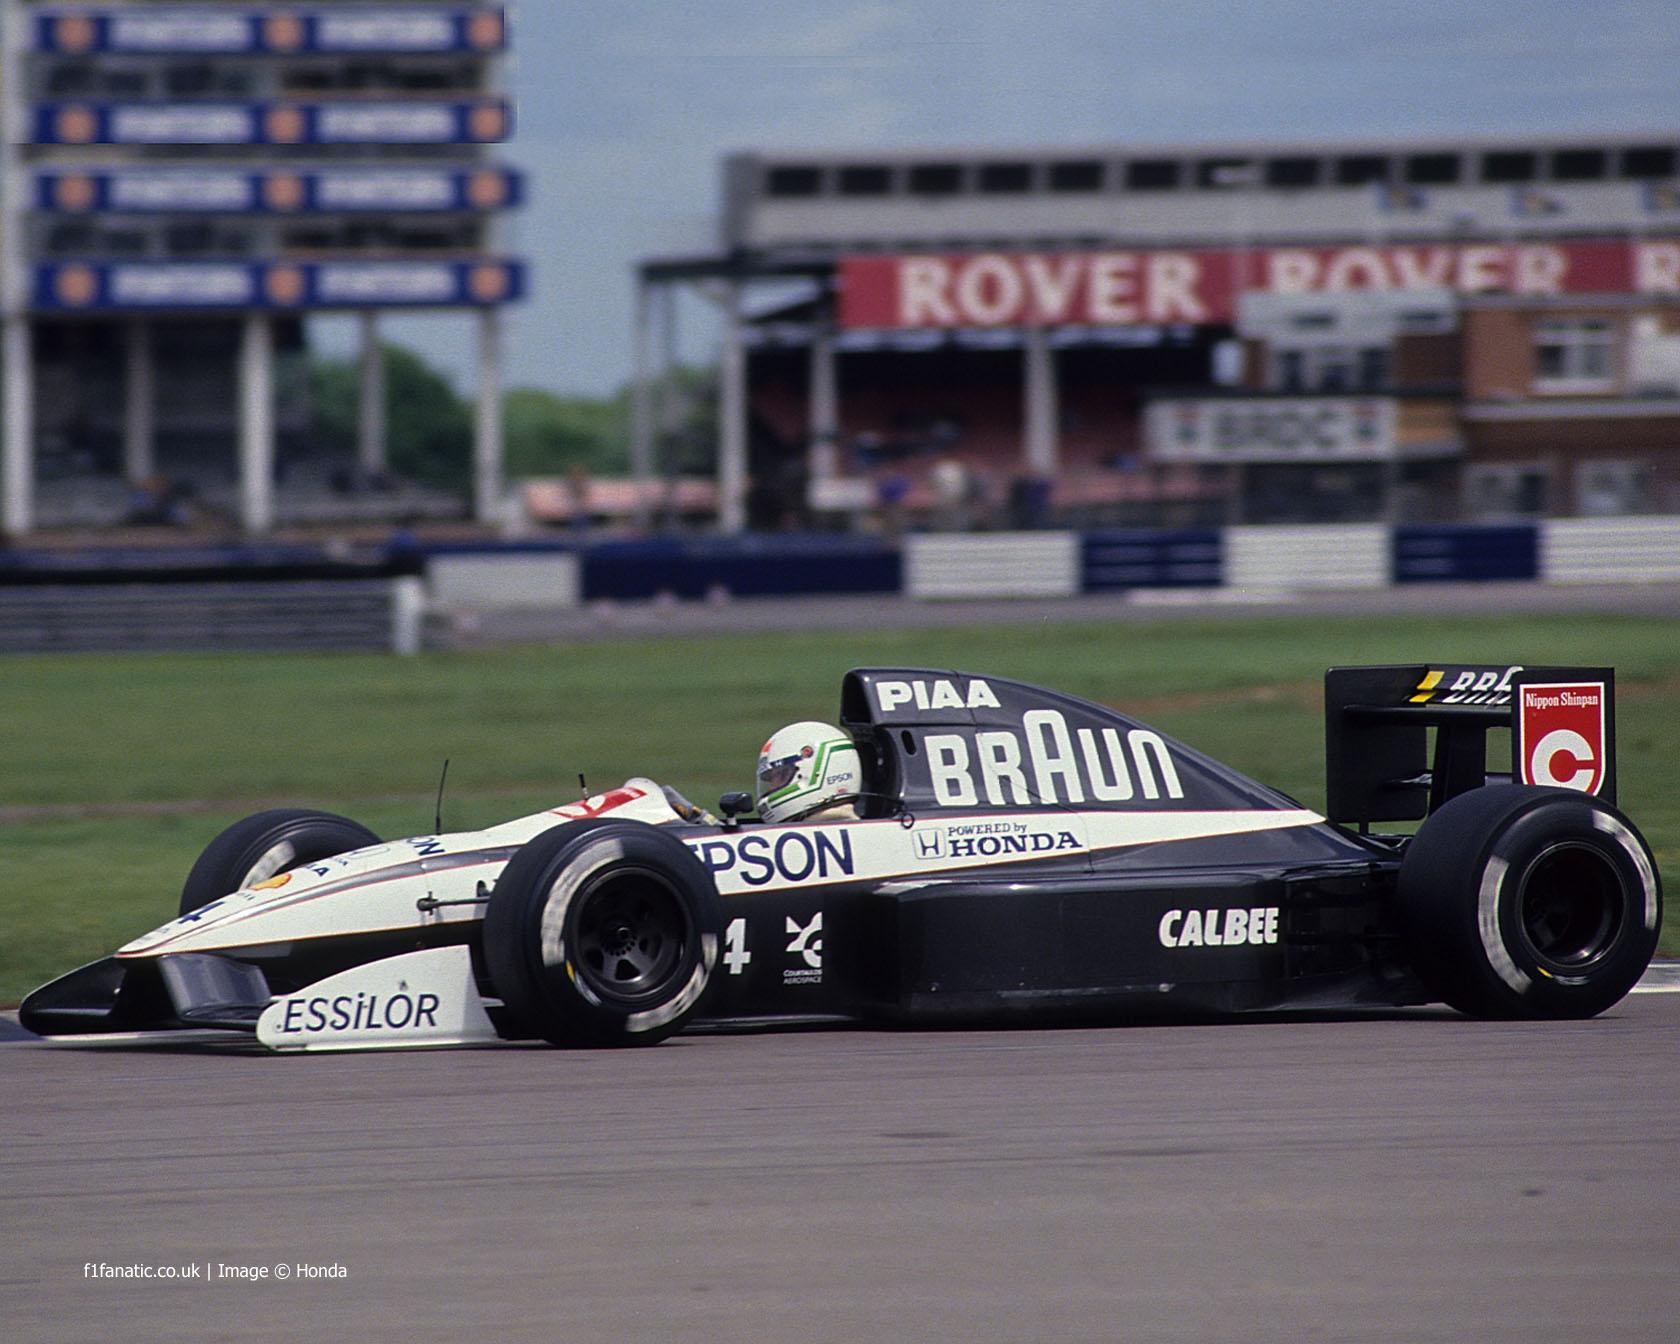 Stefano Modena, Tyrrell-Honda 020, Silverstone, 1991